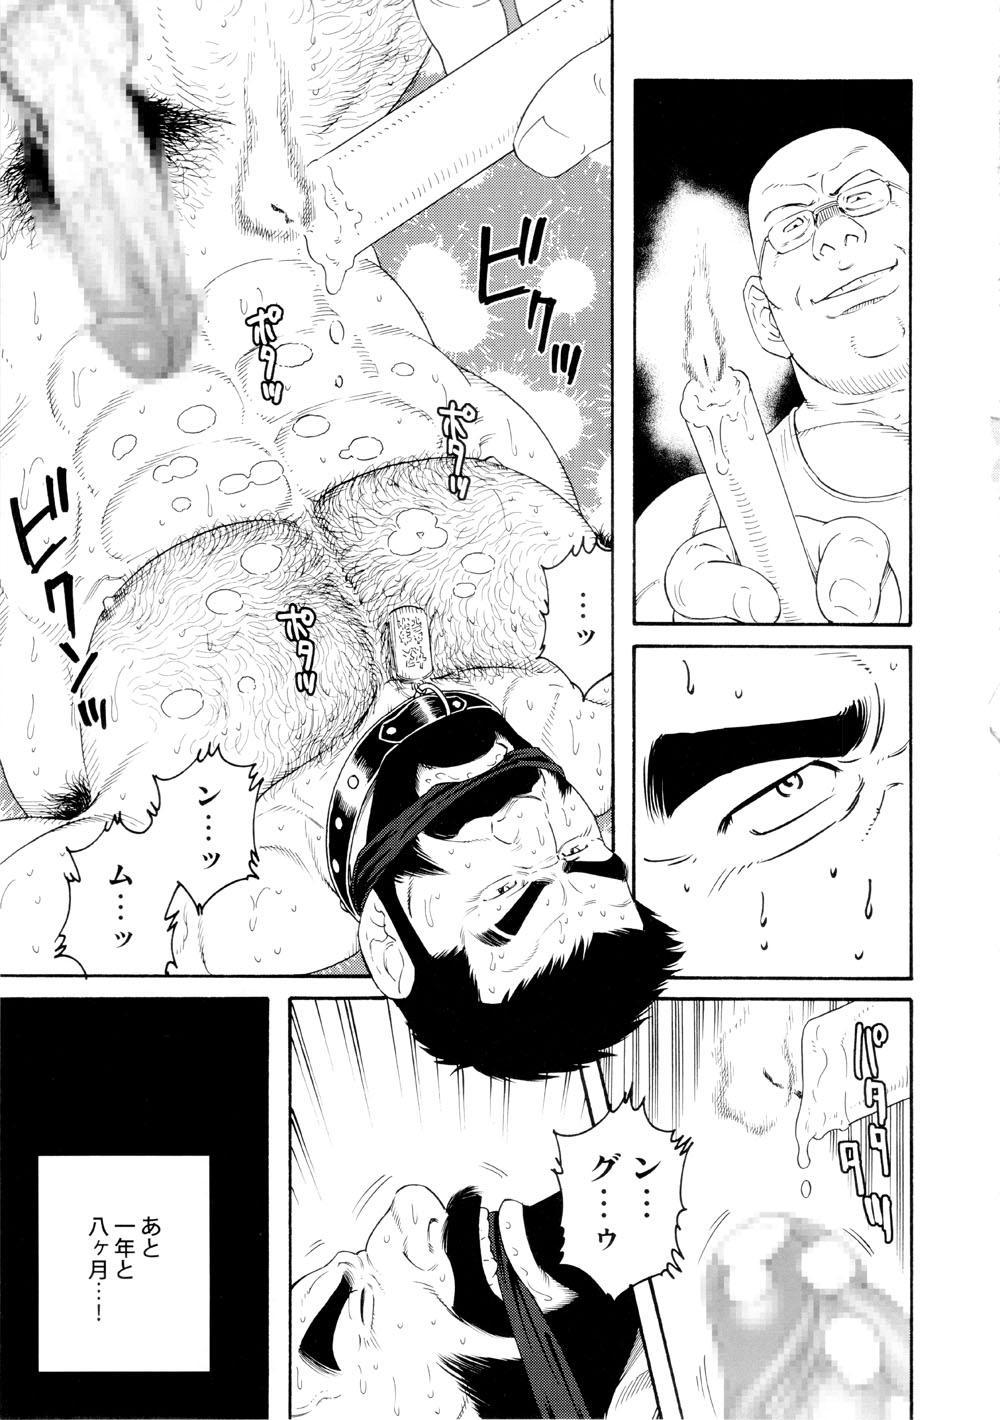 Genryu Chapter 3 4